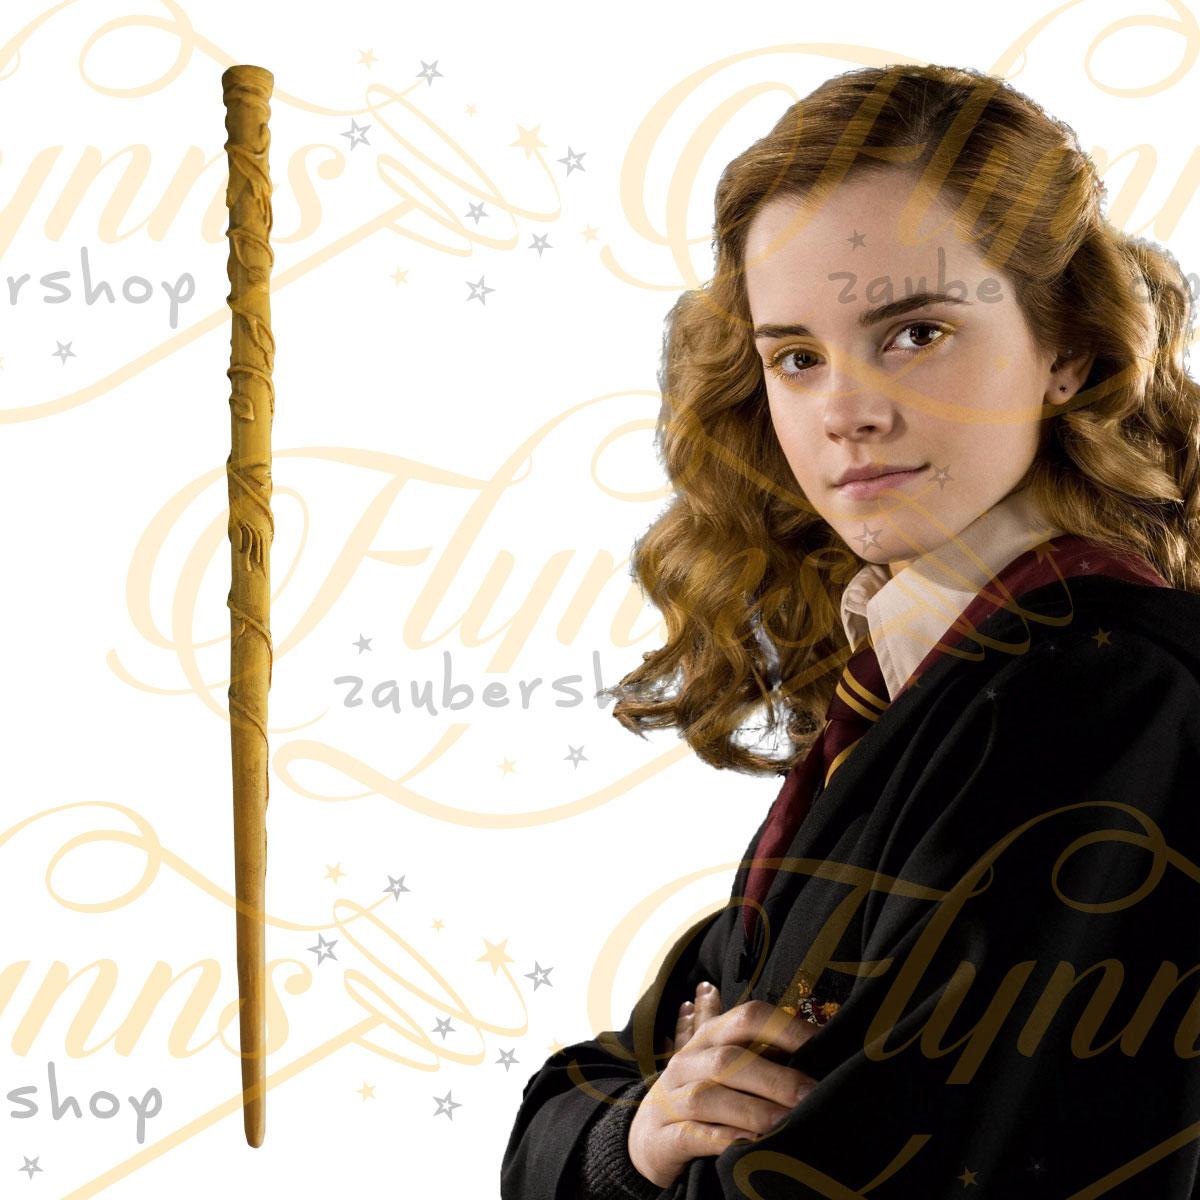 Hermine Granger | Harry Potter | Flynns Zaubershop